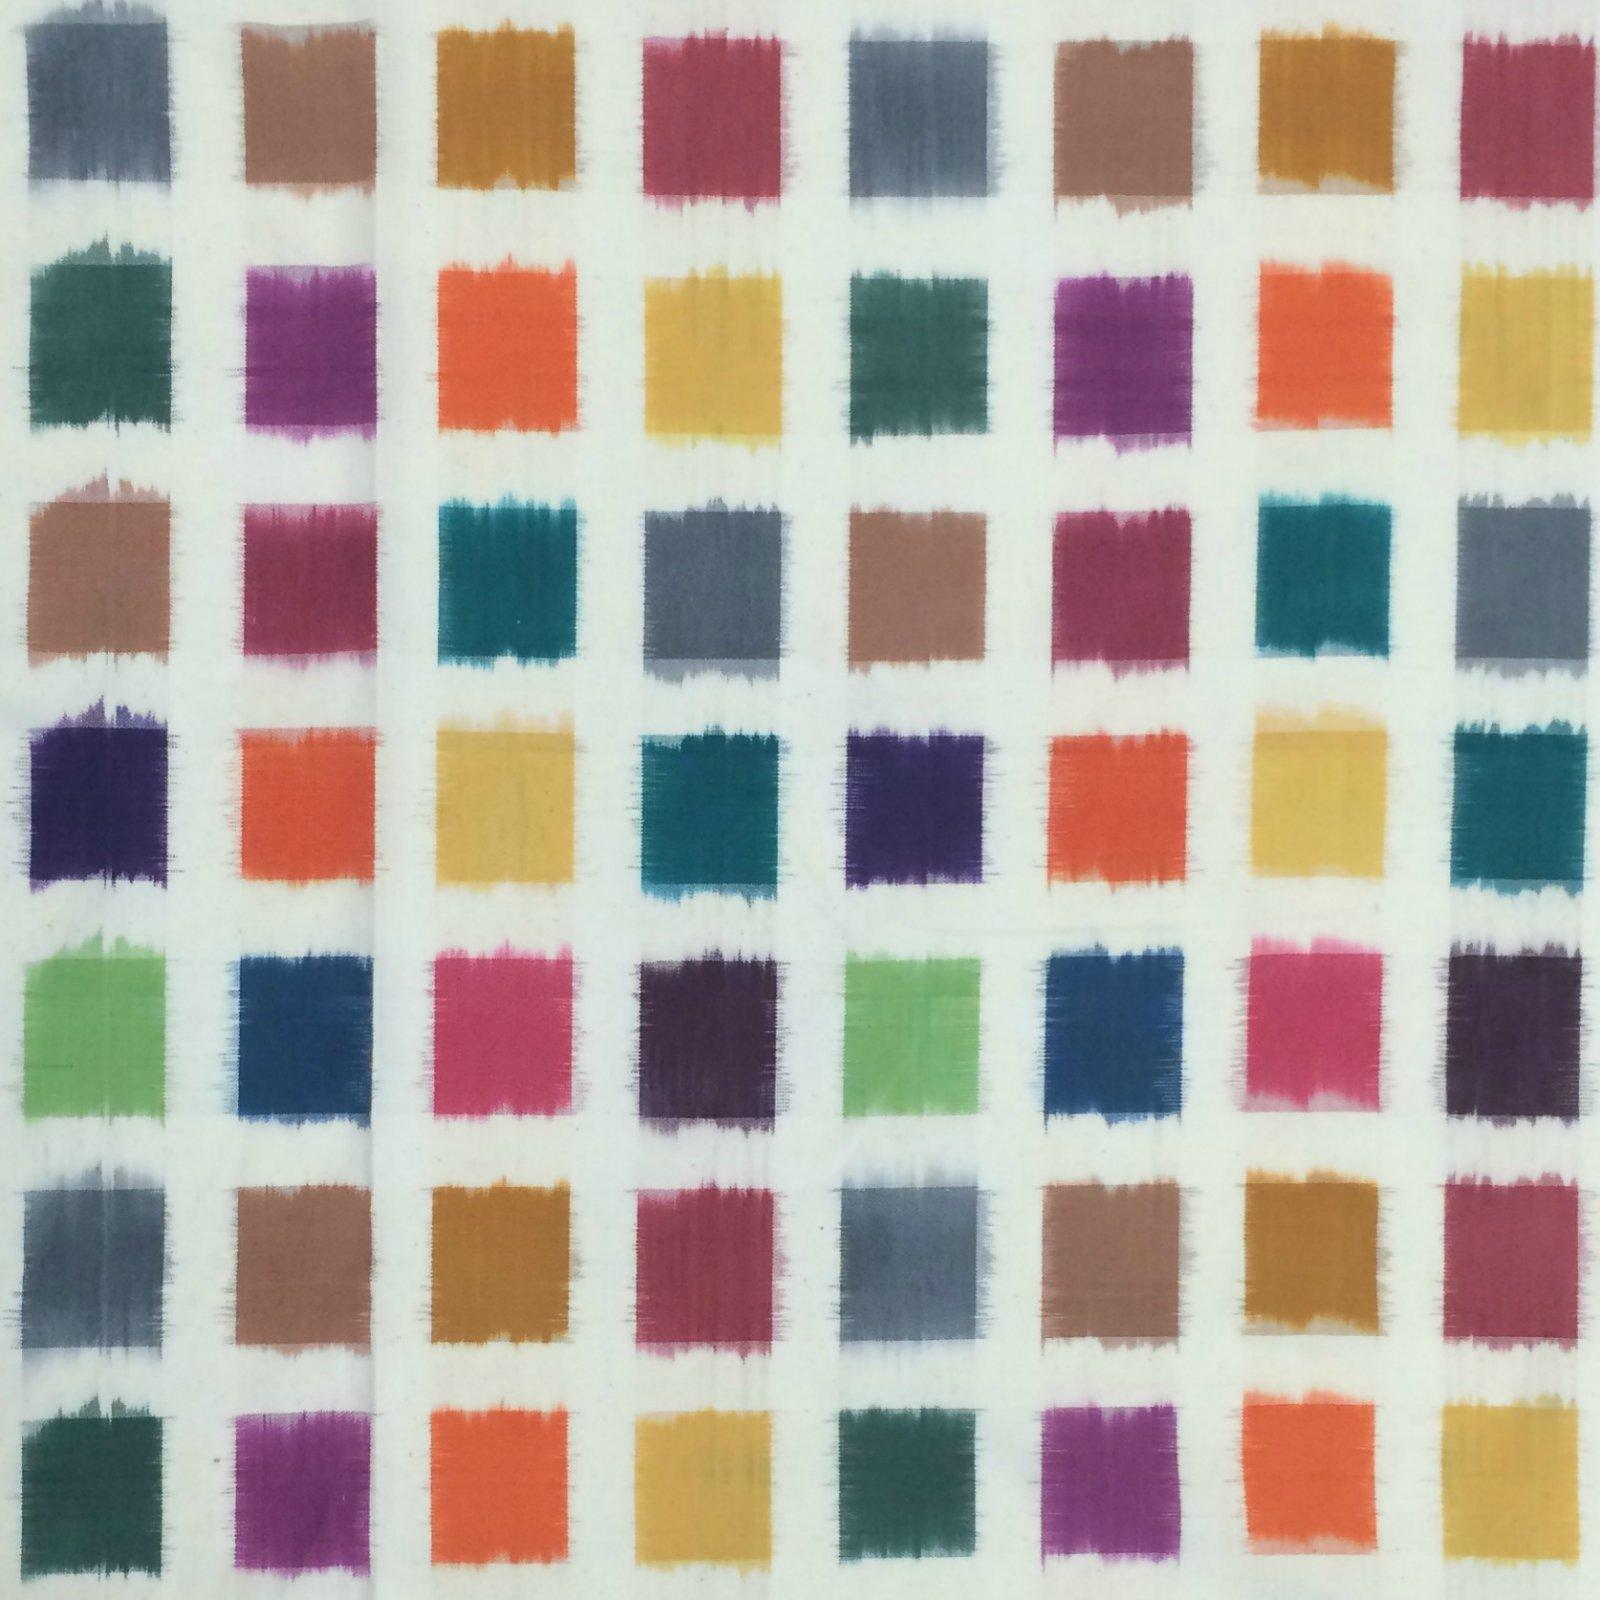 Rainbow Squares Ikat - Natural